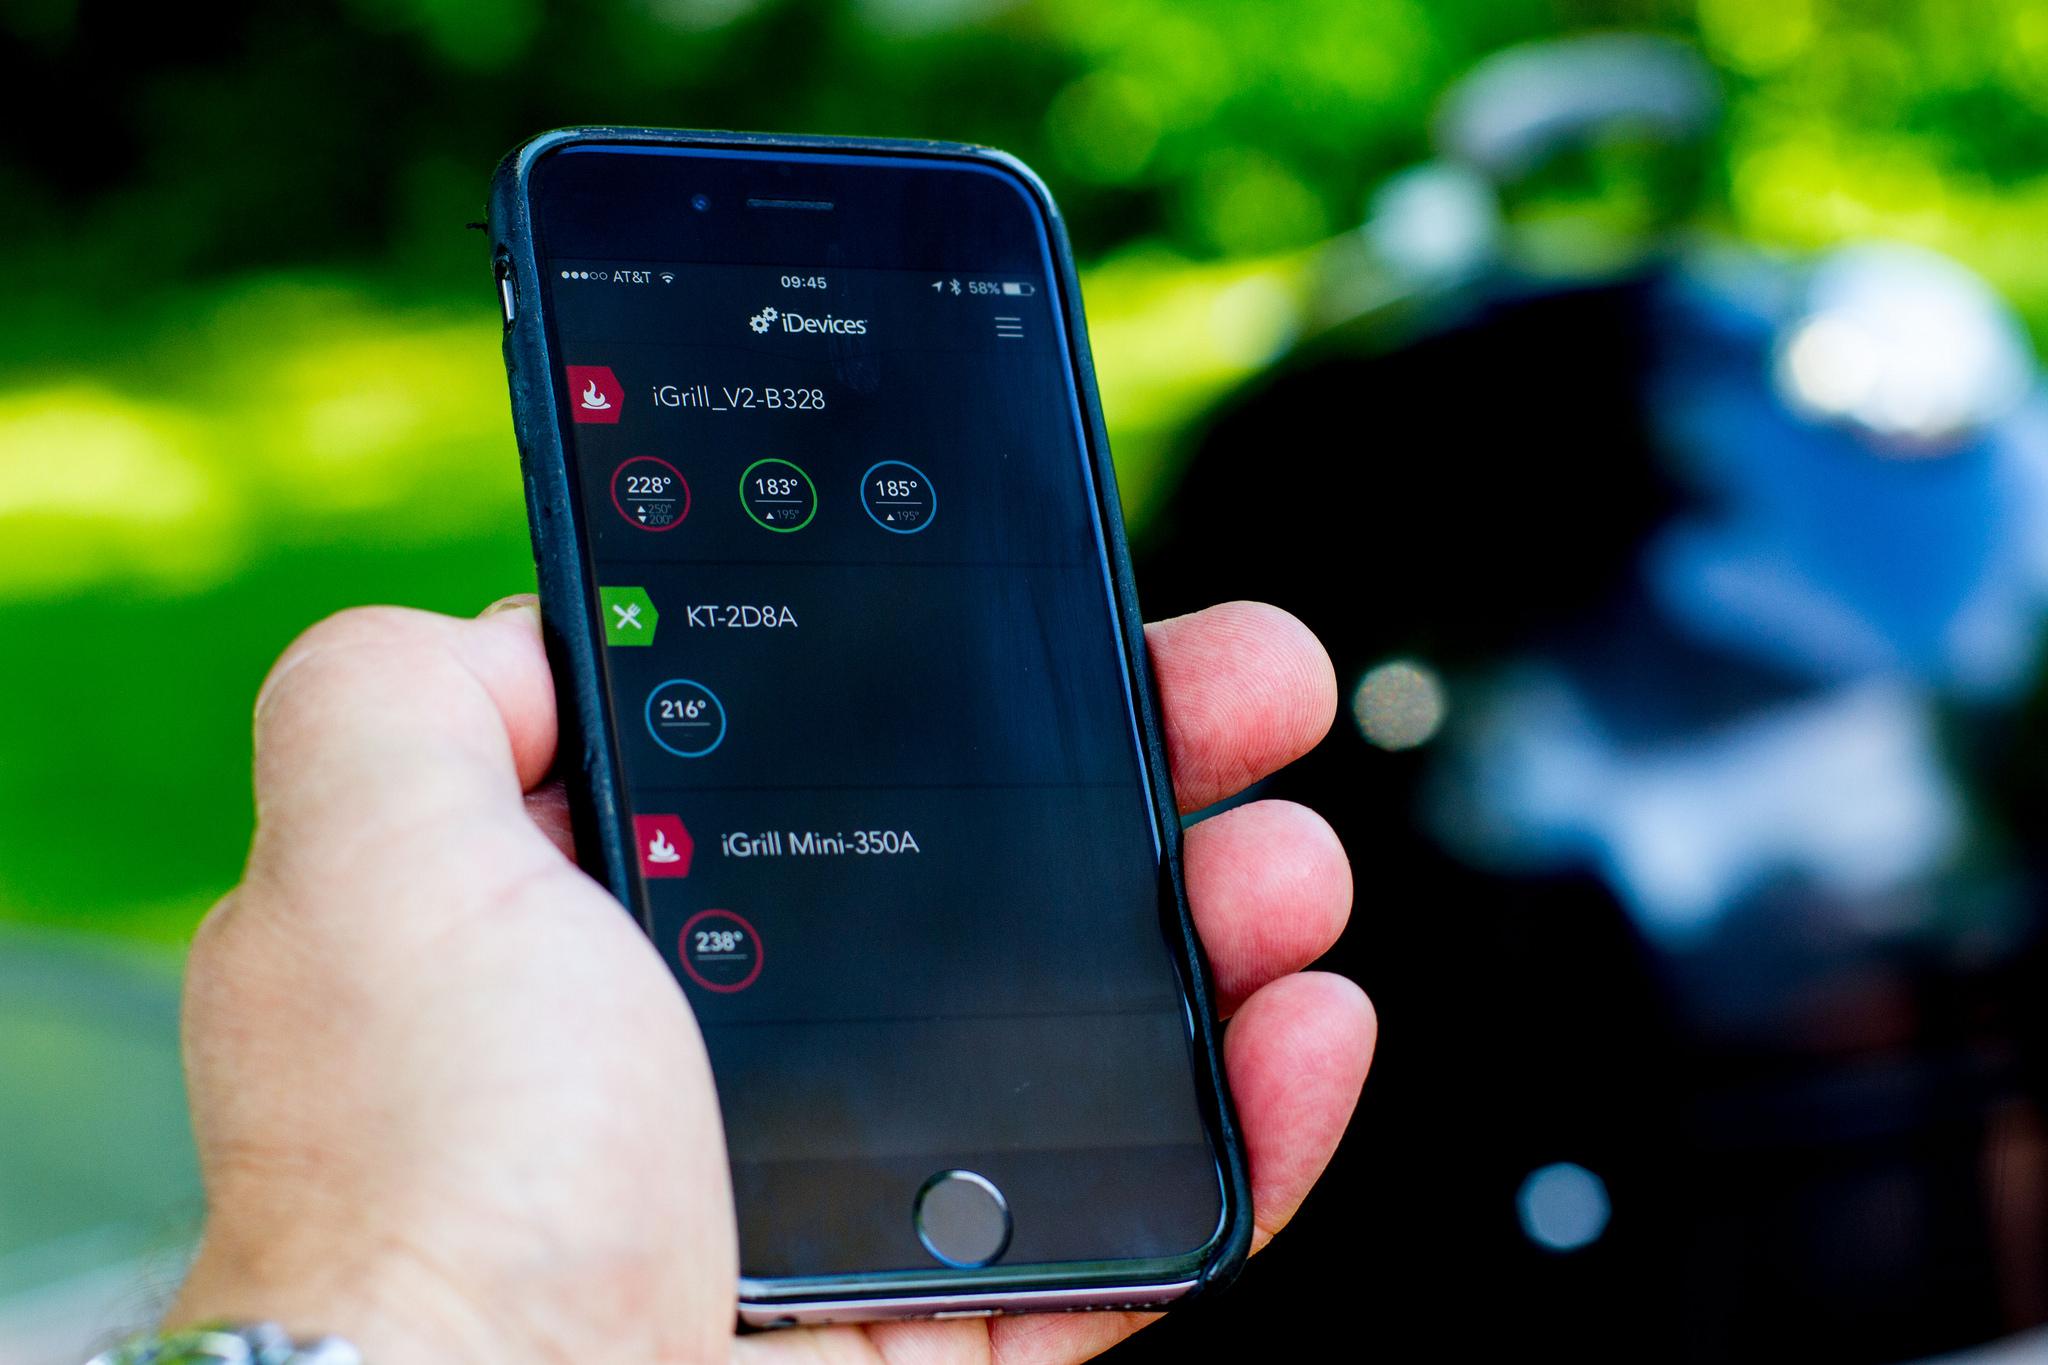 iphone with igrill app.jpg